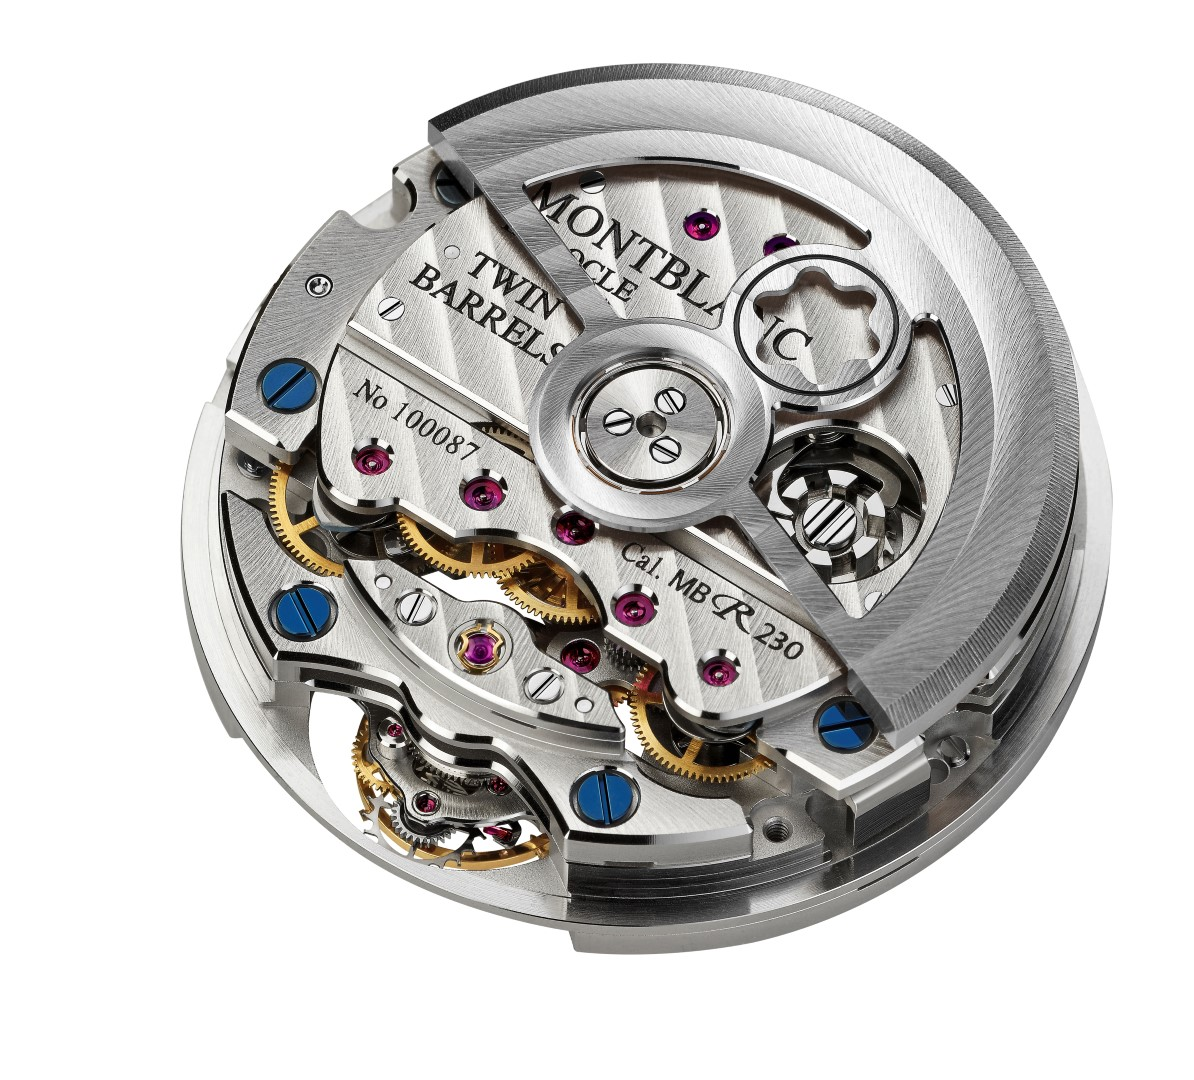 MontBlanc & MDT Montblanc-Heritage-Chronométrie-ExoTourbillon-Calibre-MB-R230-oro-blanco